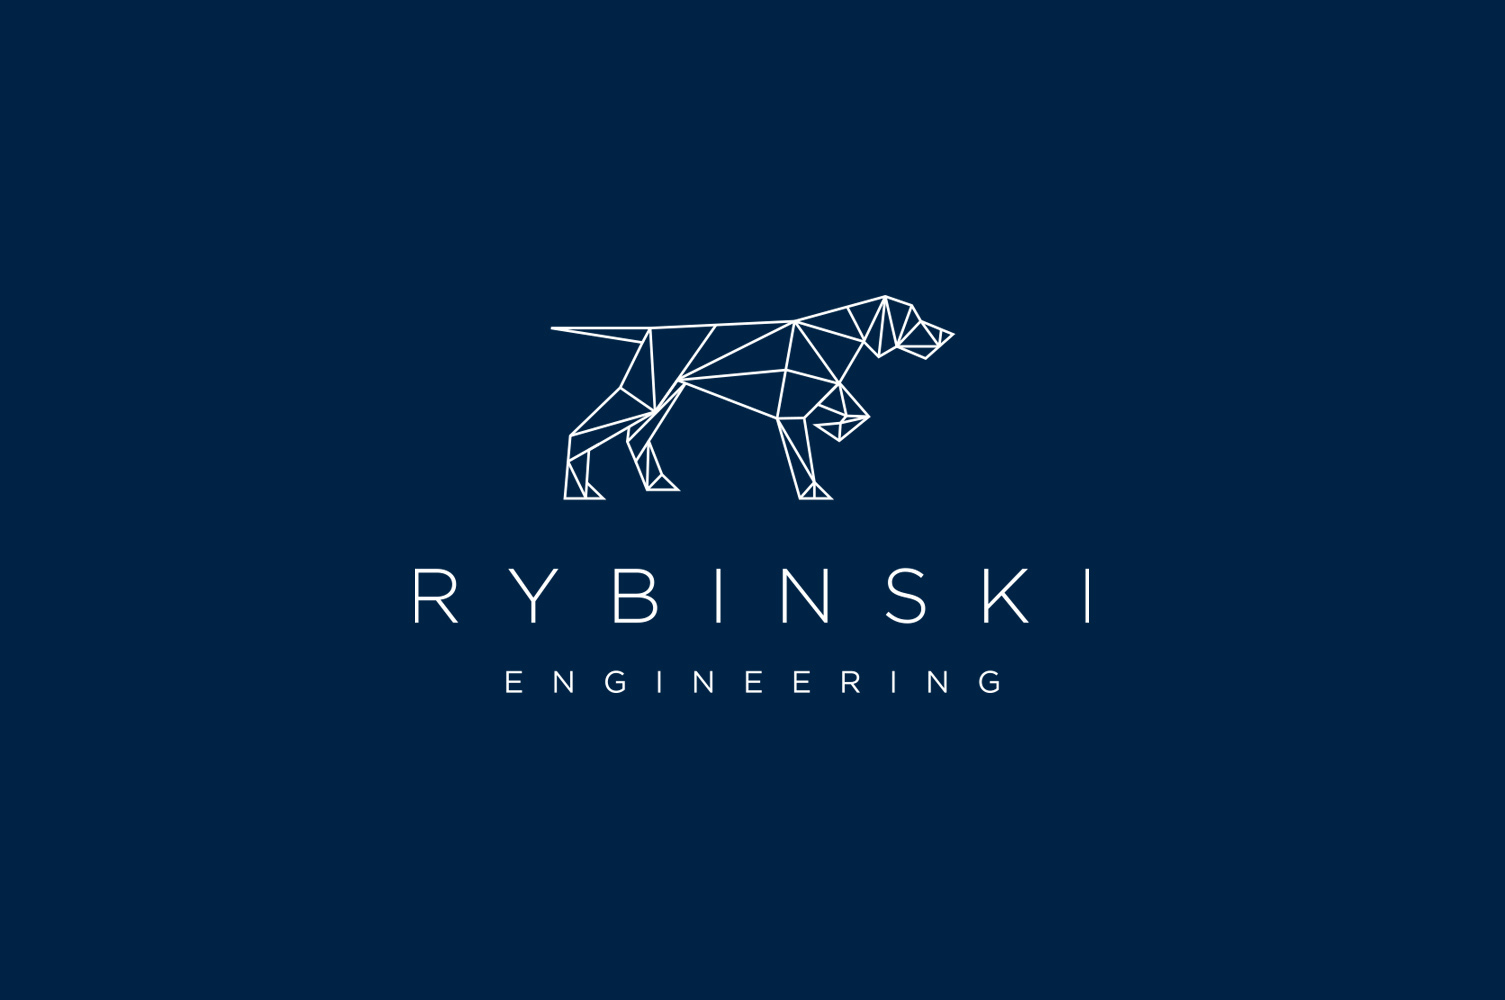 Rybinski-Engineering-Philadelphia-Dog-Pointer-Geometric-Logo.jpg